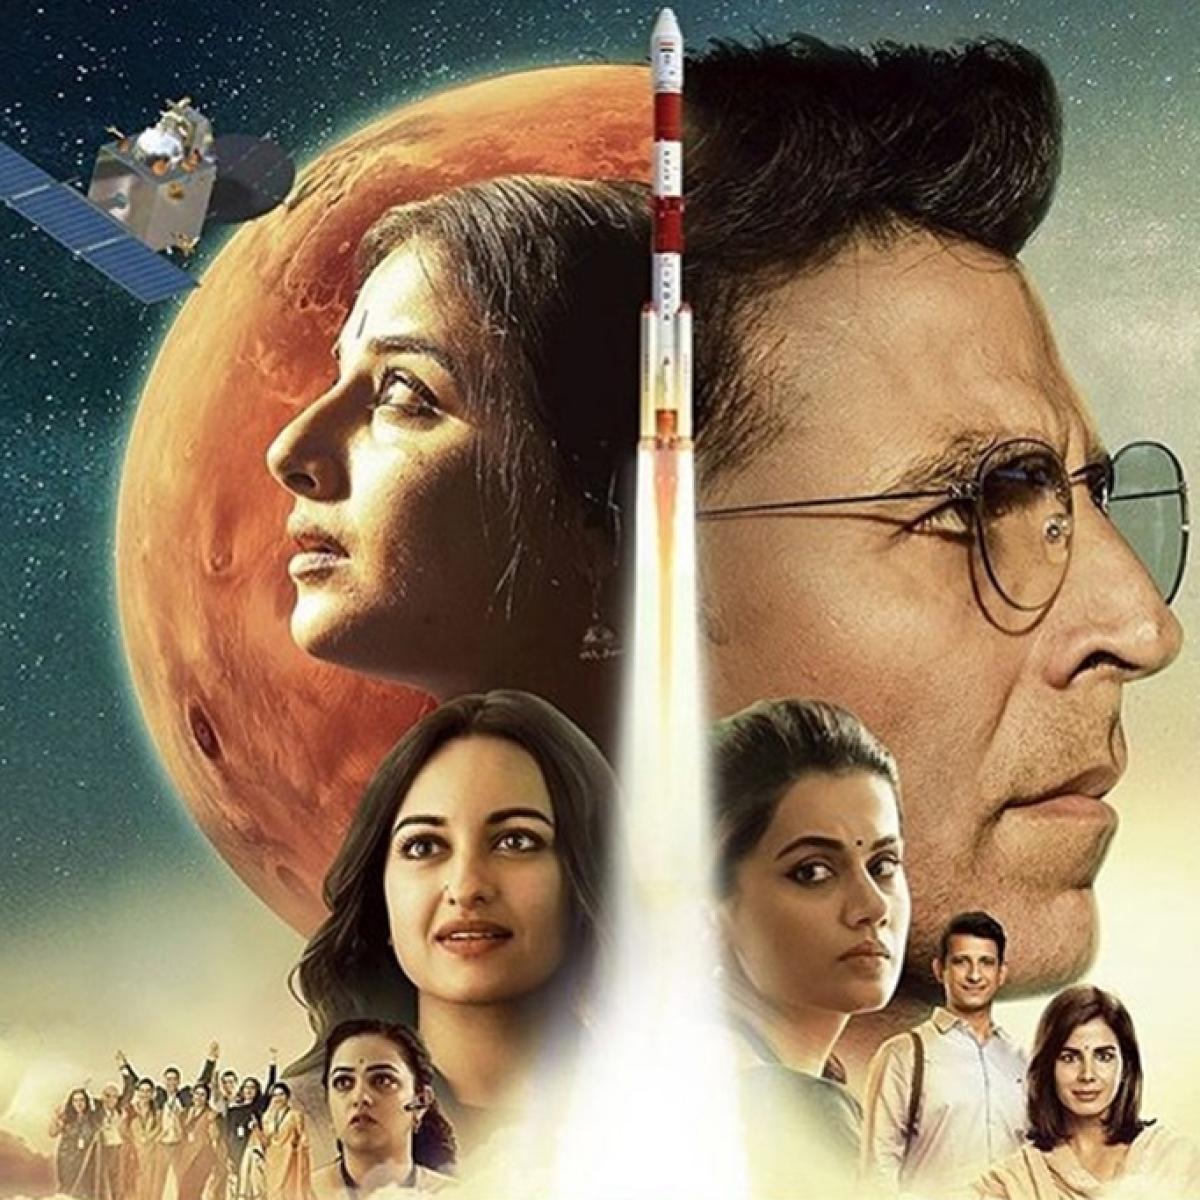 Akshay Kumar and Vidya Balan's 'Mission Mangal' crosses 175 crore mark